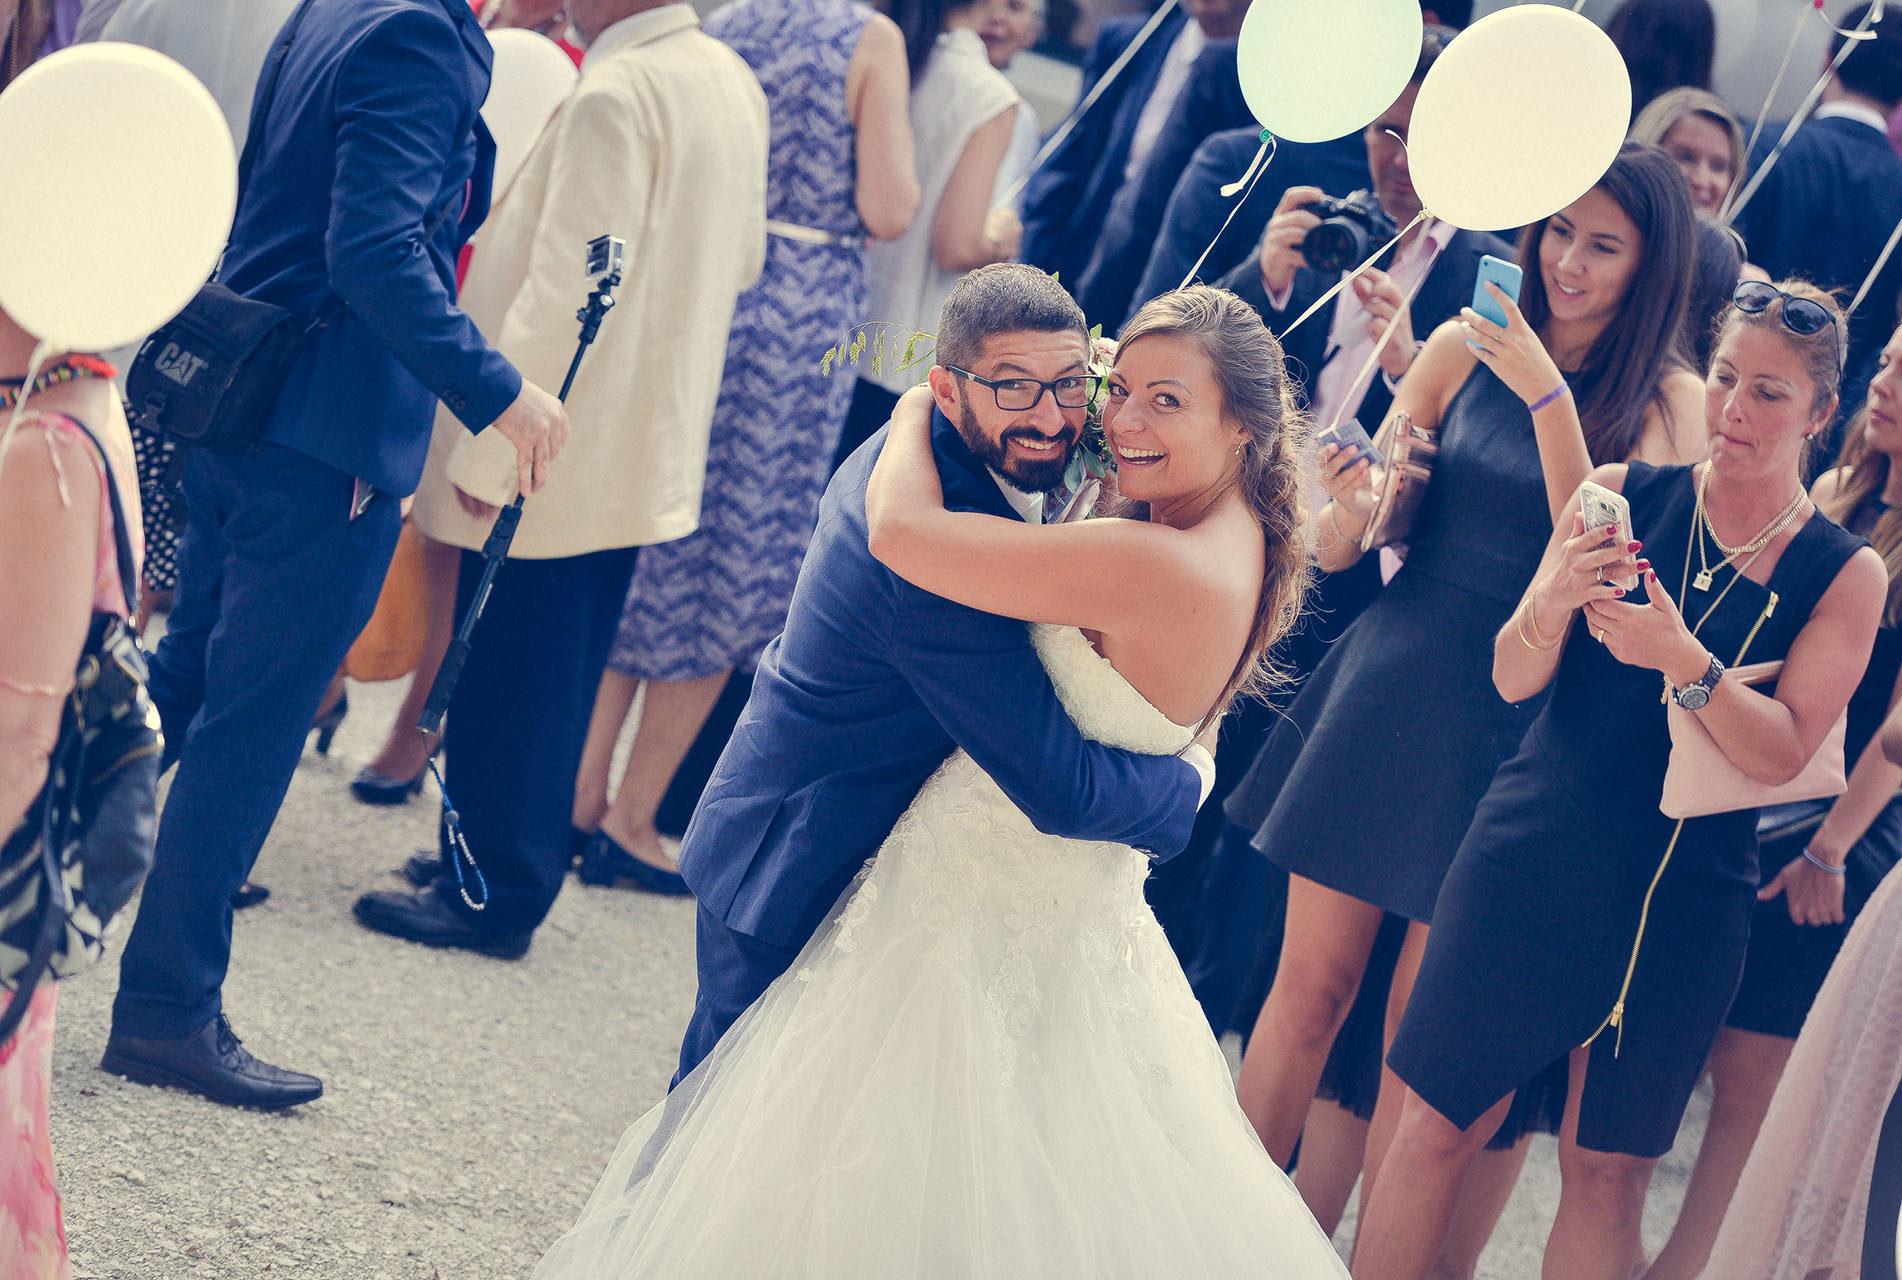 maya-angelsen-photographe-mariage-ile-de-france-val-de-marne